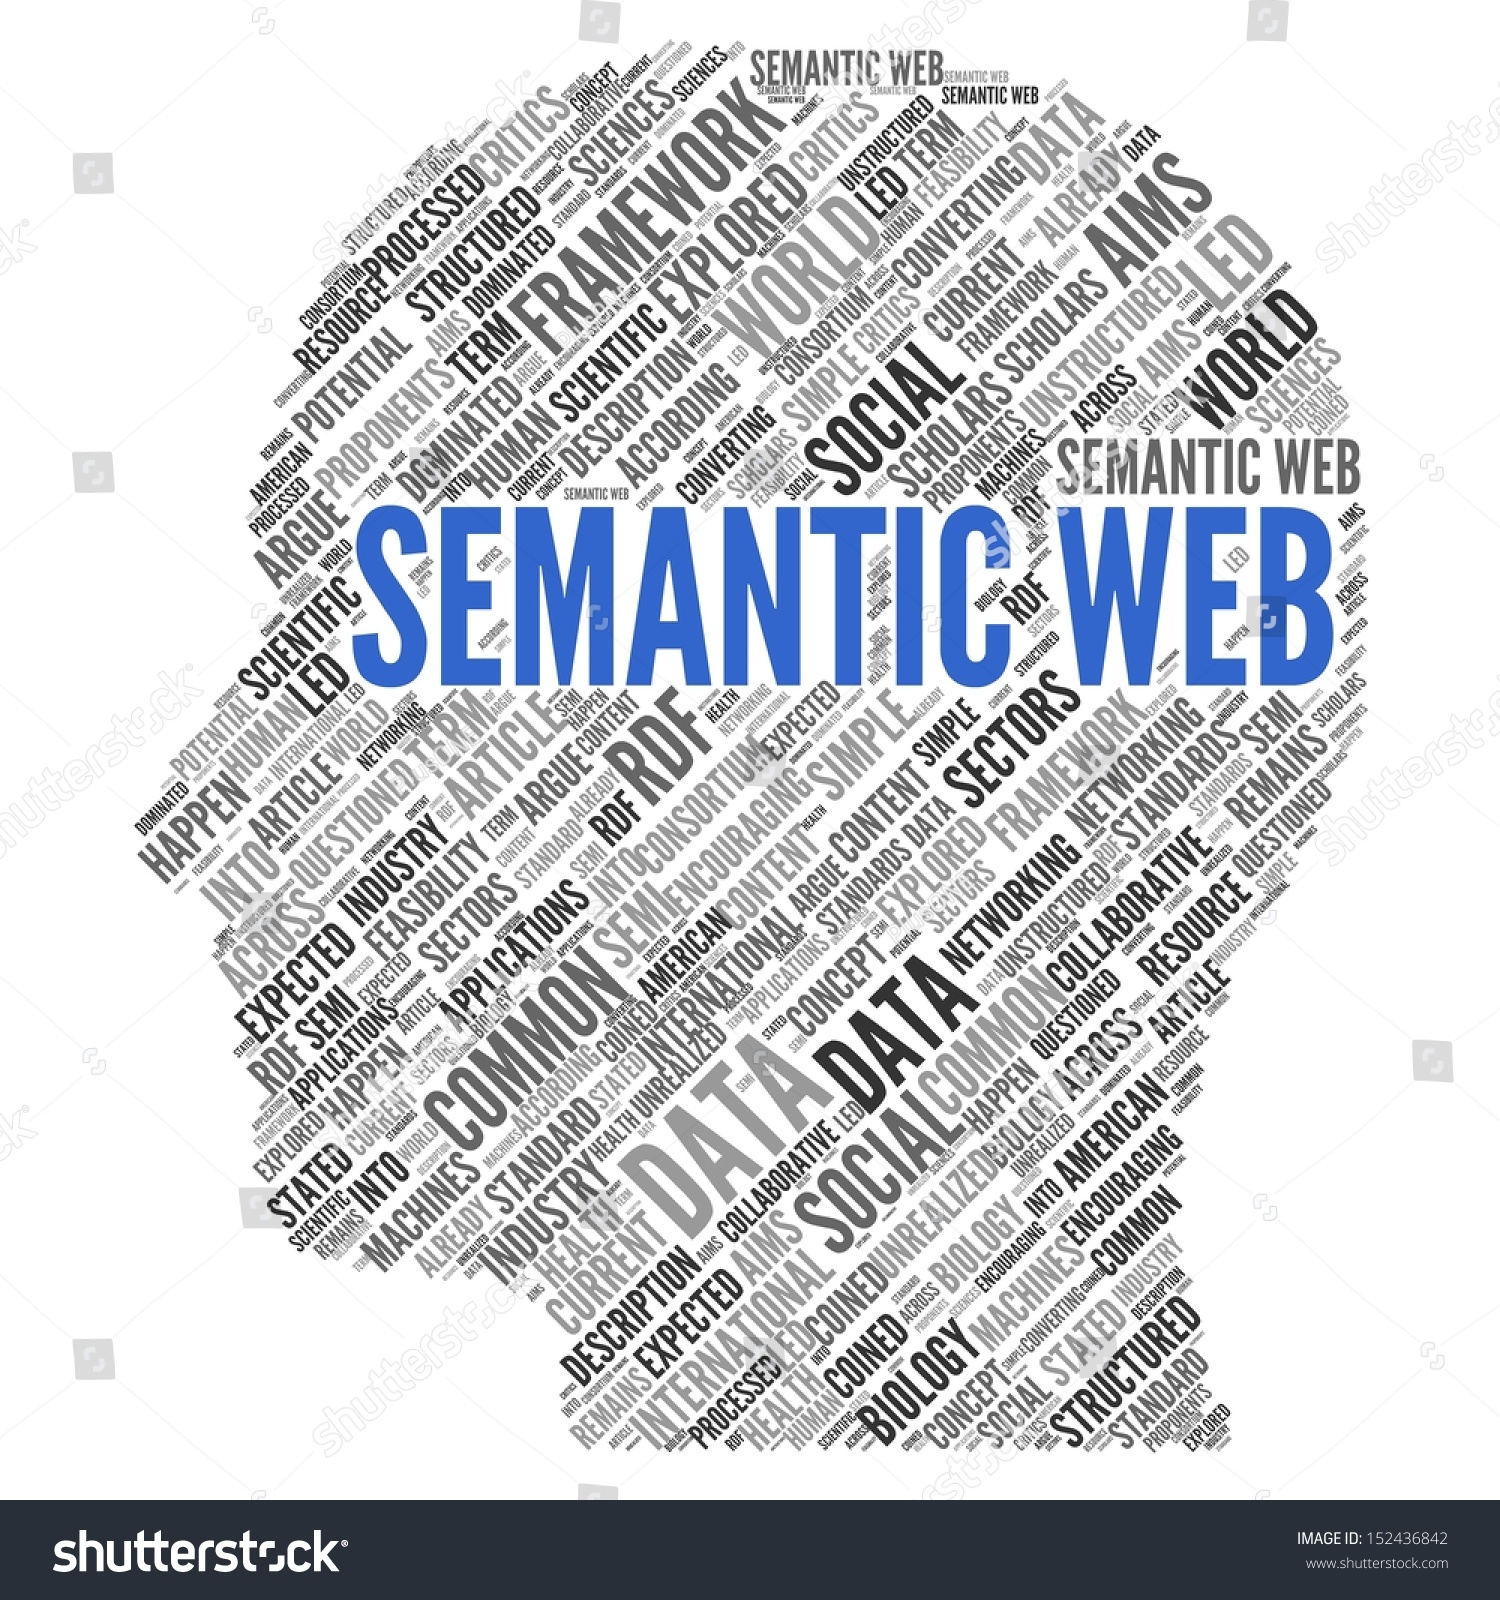 Semantic Web Systems